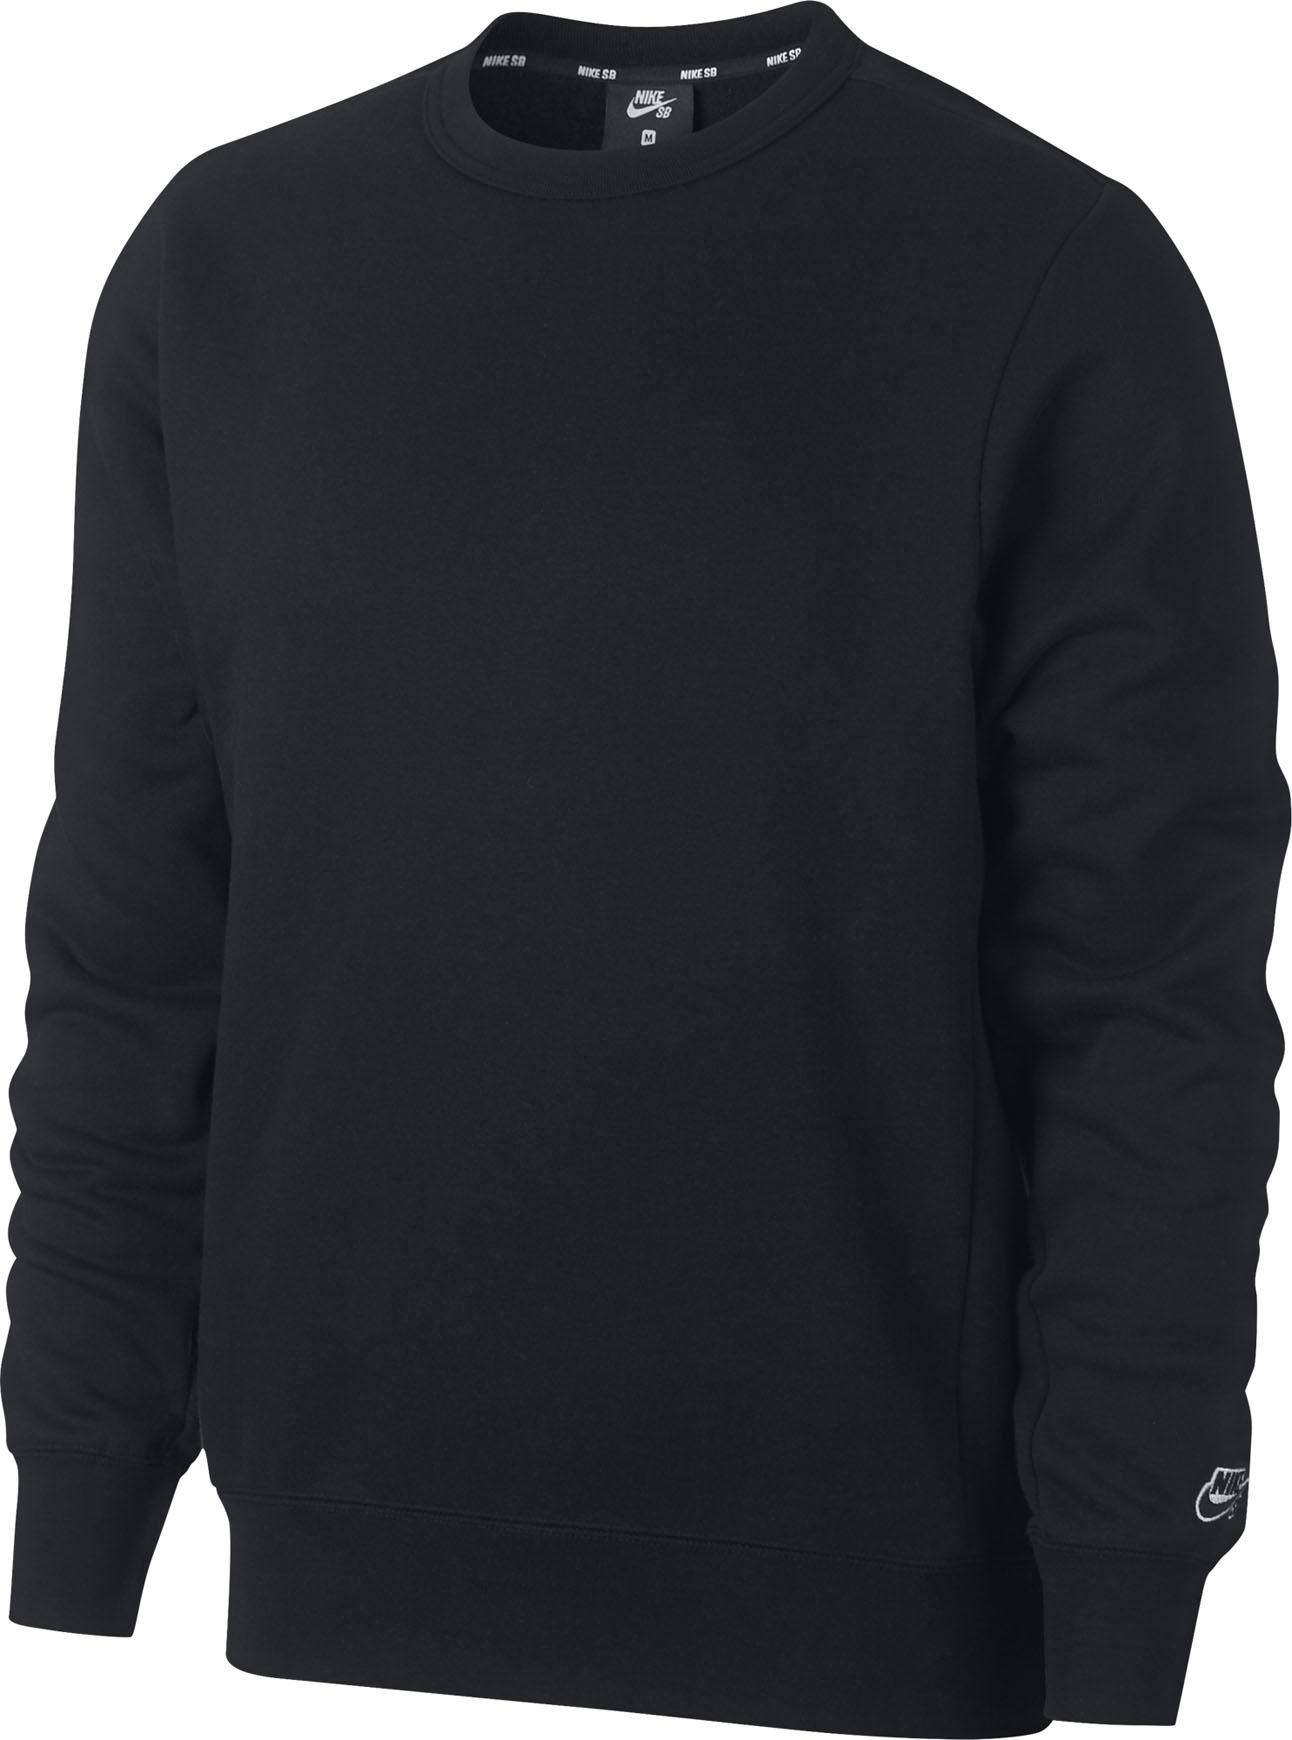 Nike SB Icon Crew Fleece Essential BlackBlack